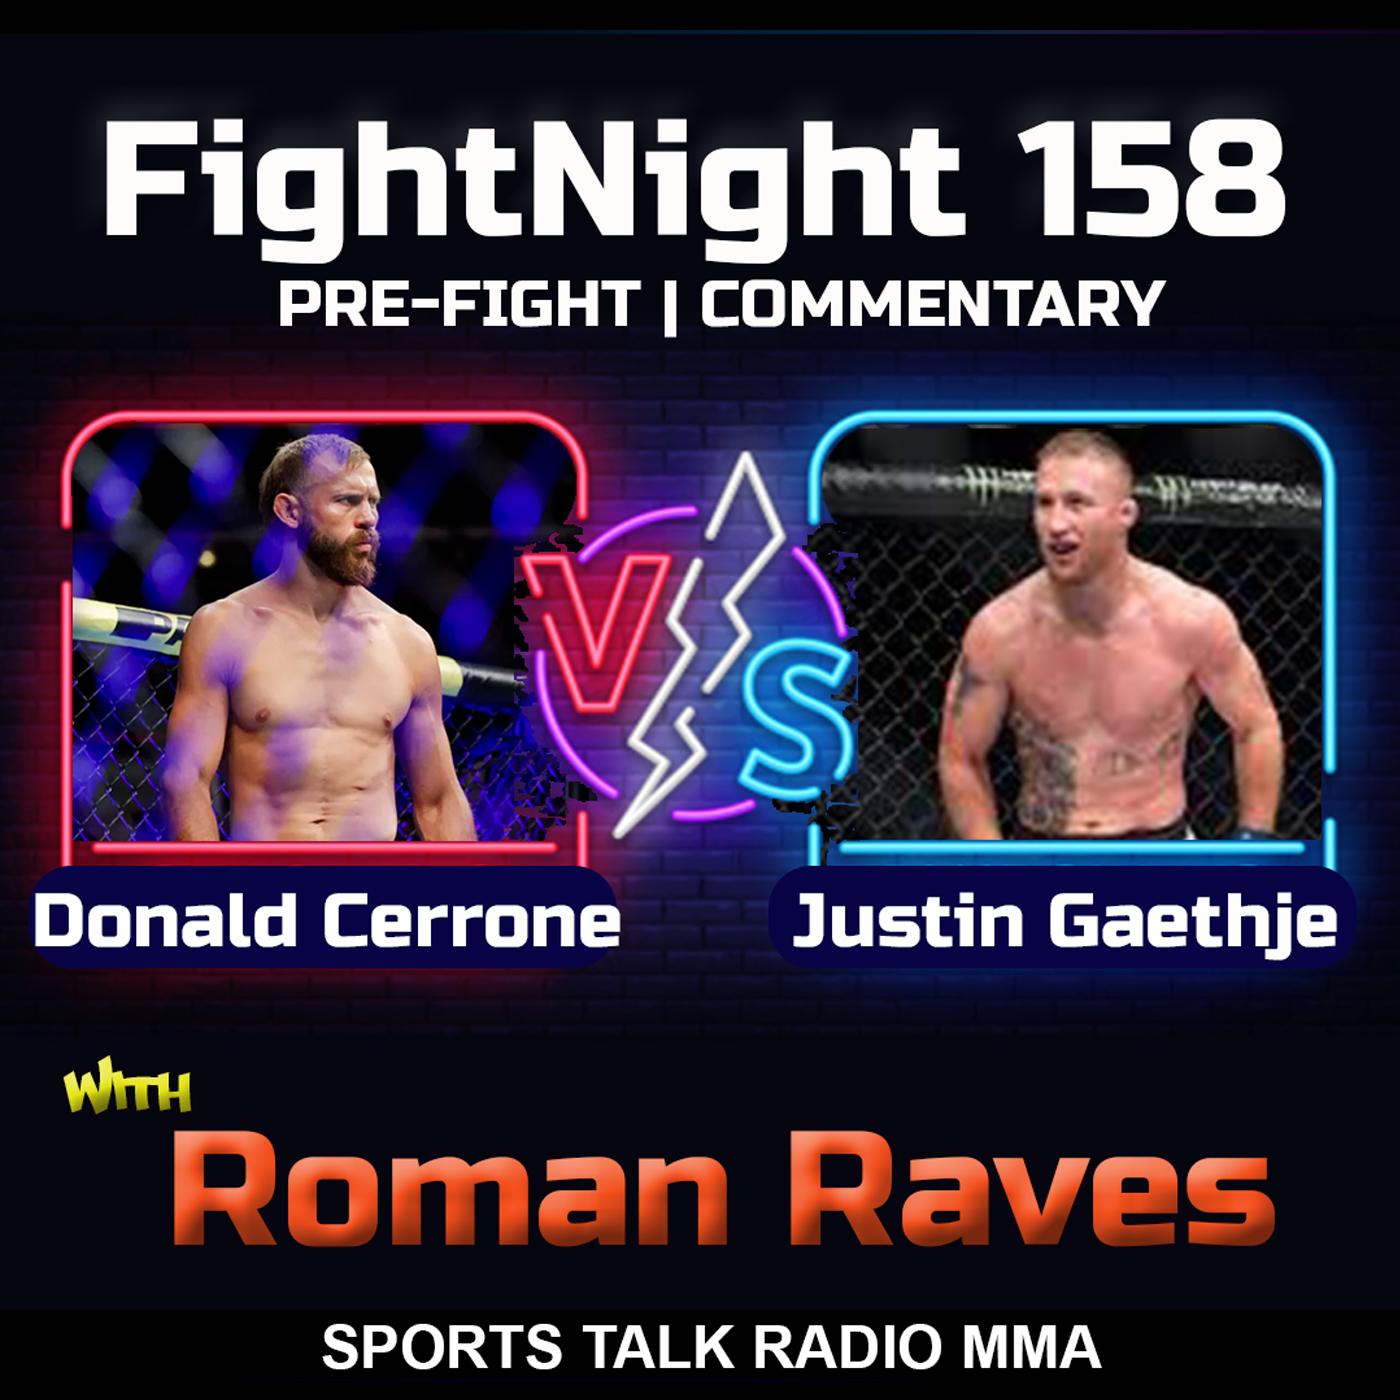 Artwork for Donald Cerrone vs Justin Gaethje FightNight 158